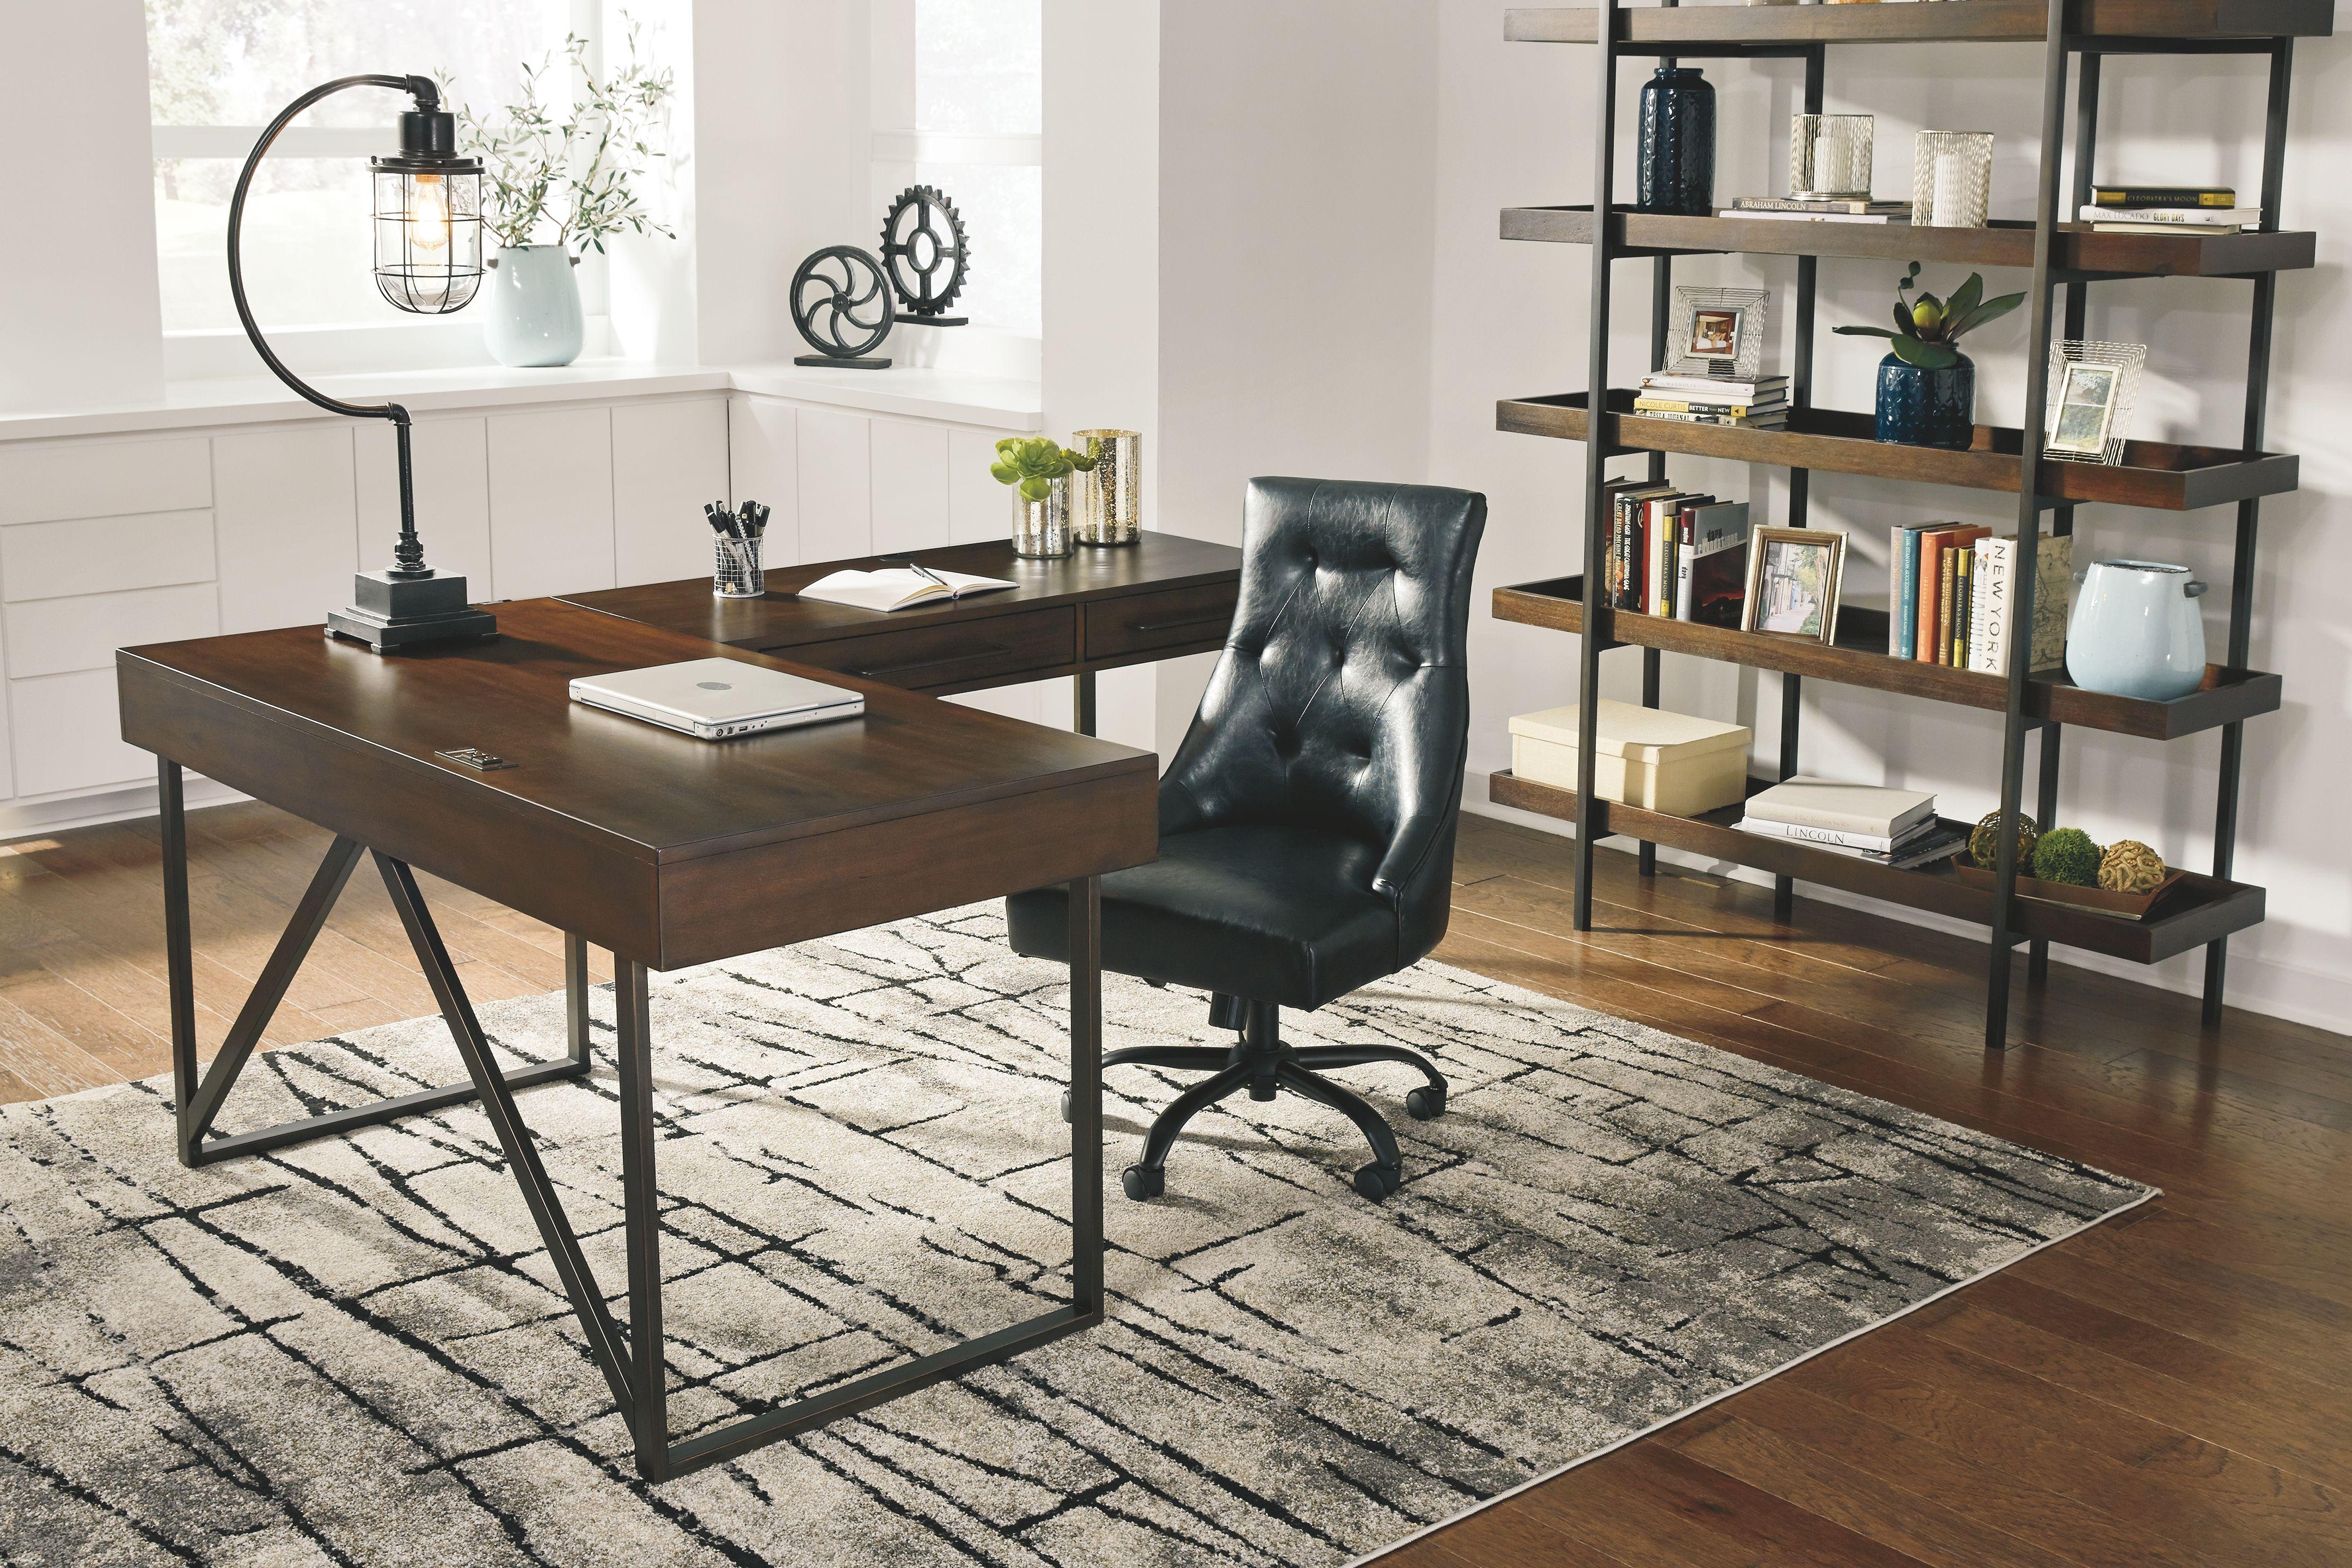 Starmore 2 Piece Home Office Desk Ashley Furniture Homestore Cheap Office Furniture Home Office Design Home Office Furniture